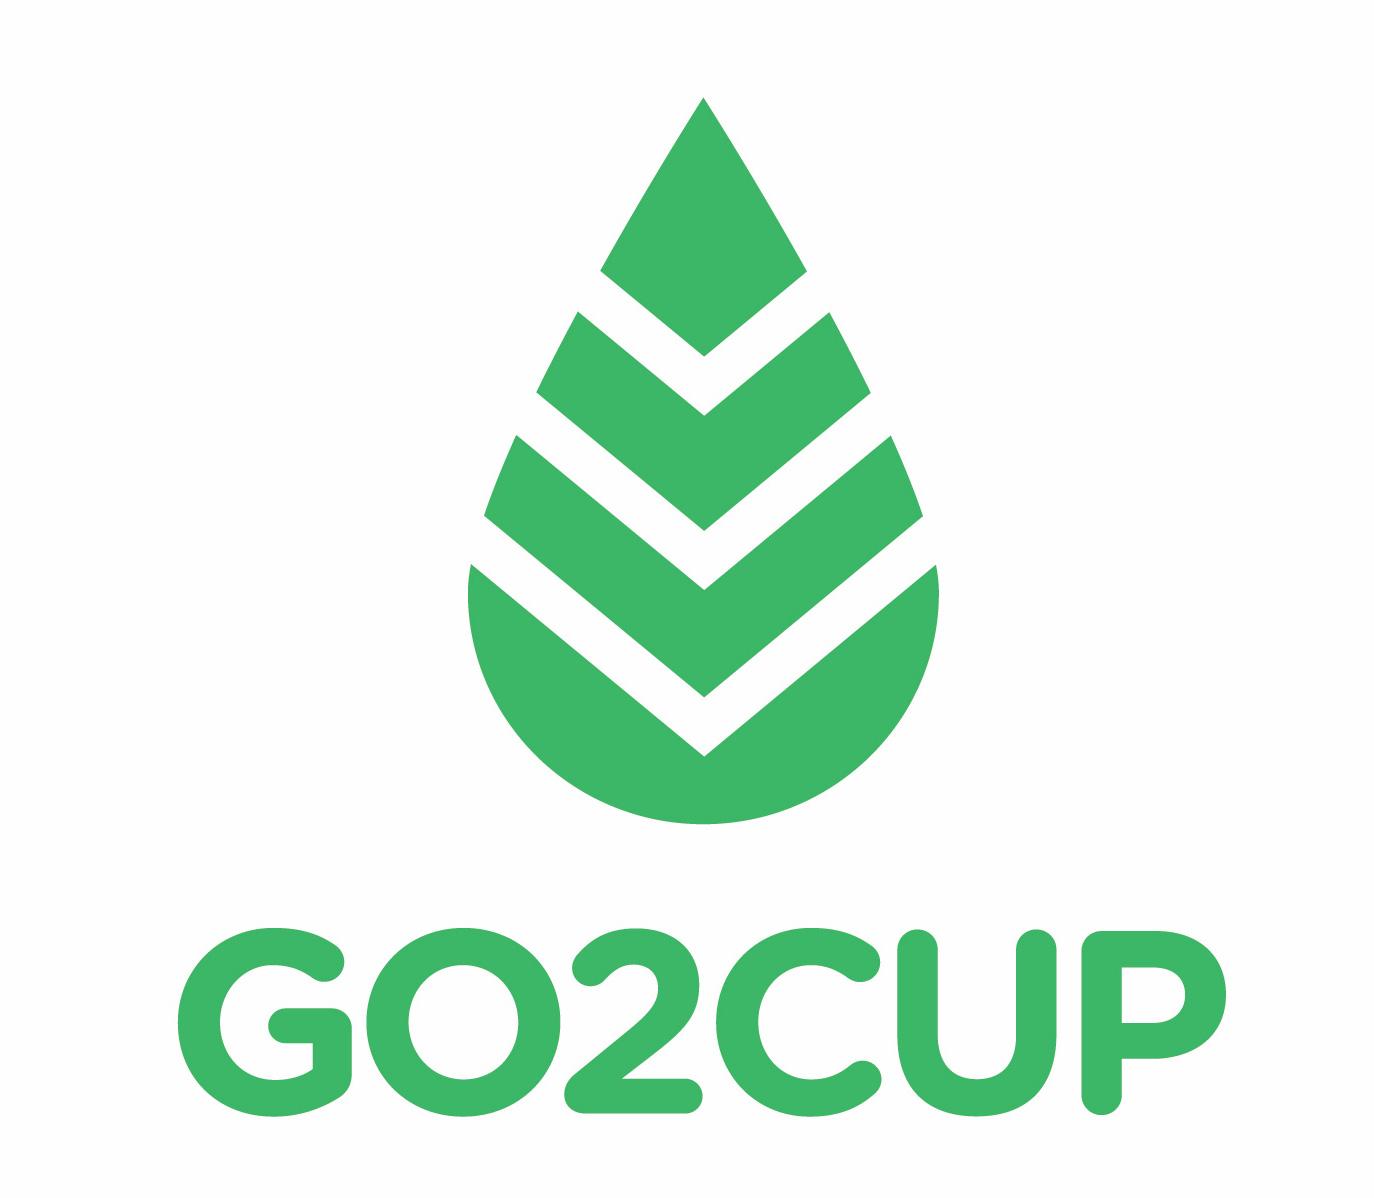 GO2CUP-green-logo.jpg